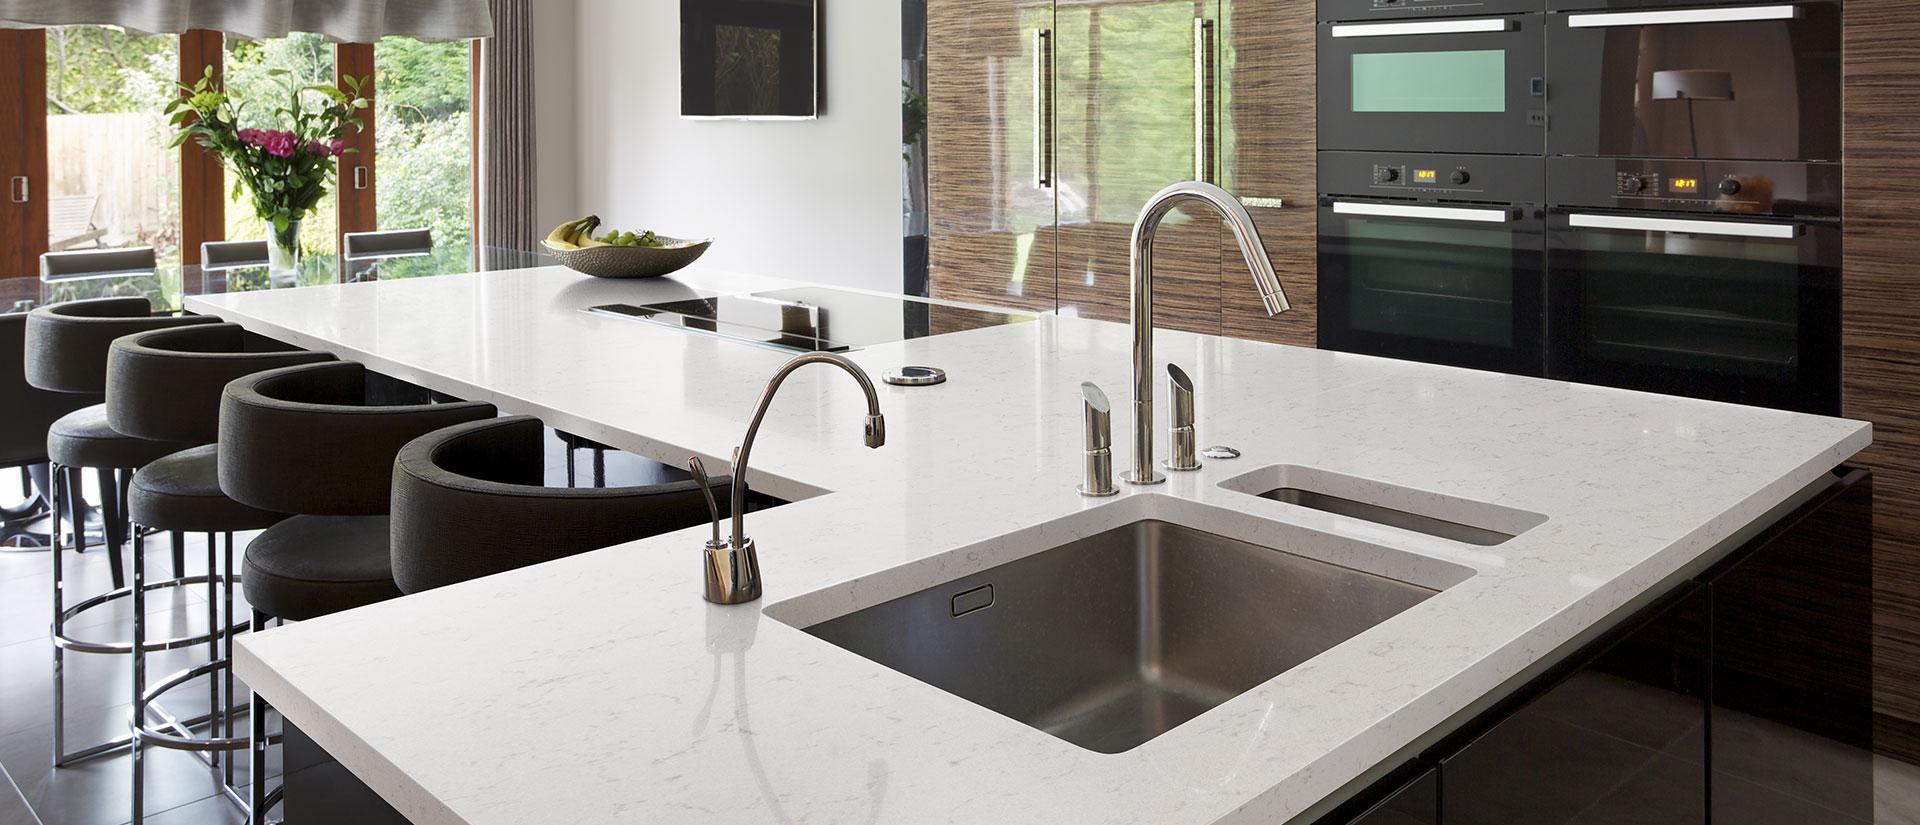 New Carrara Marmi Quartz Countertops Q White Quartz